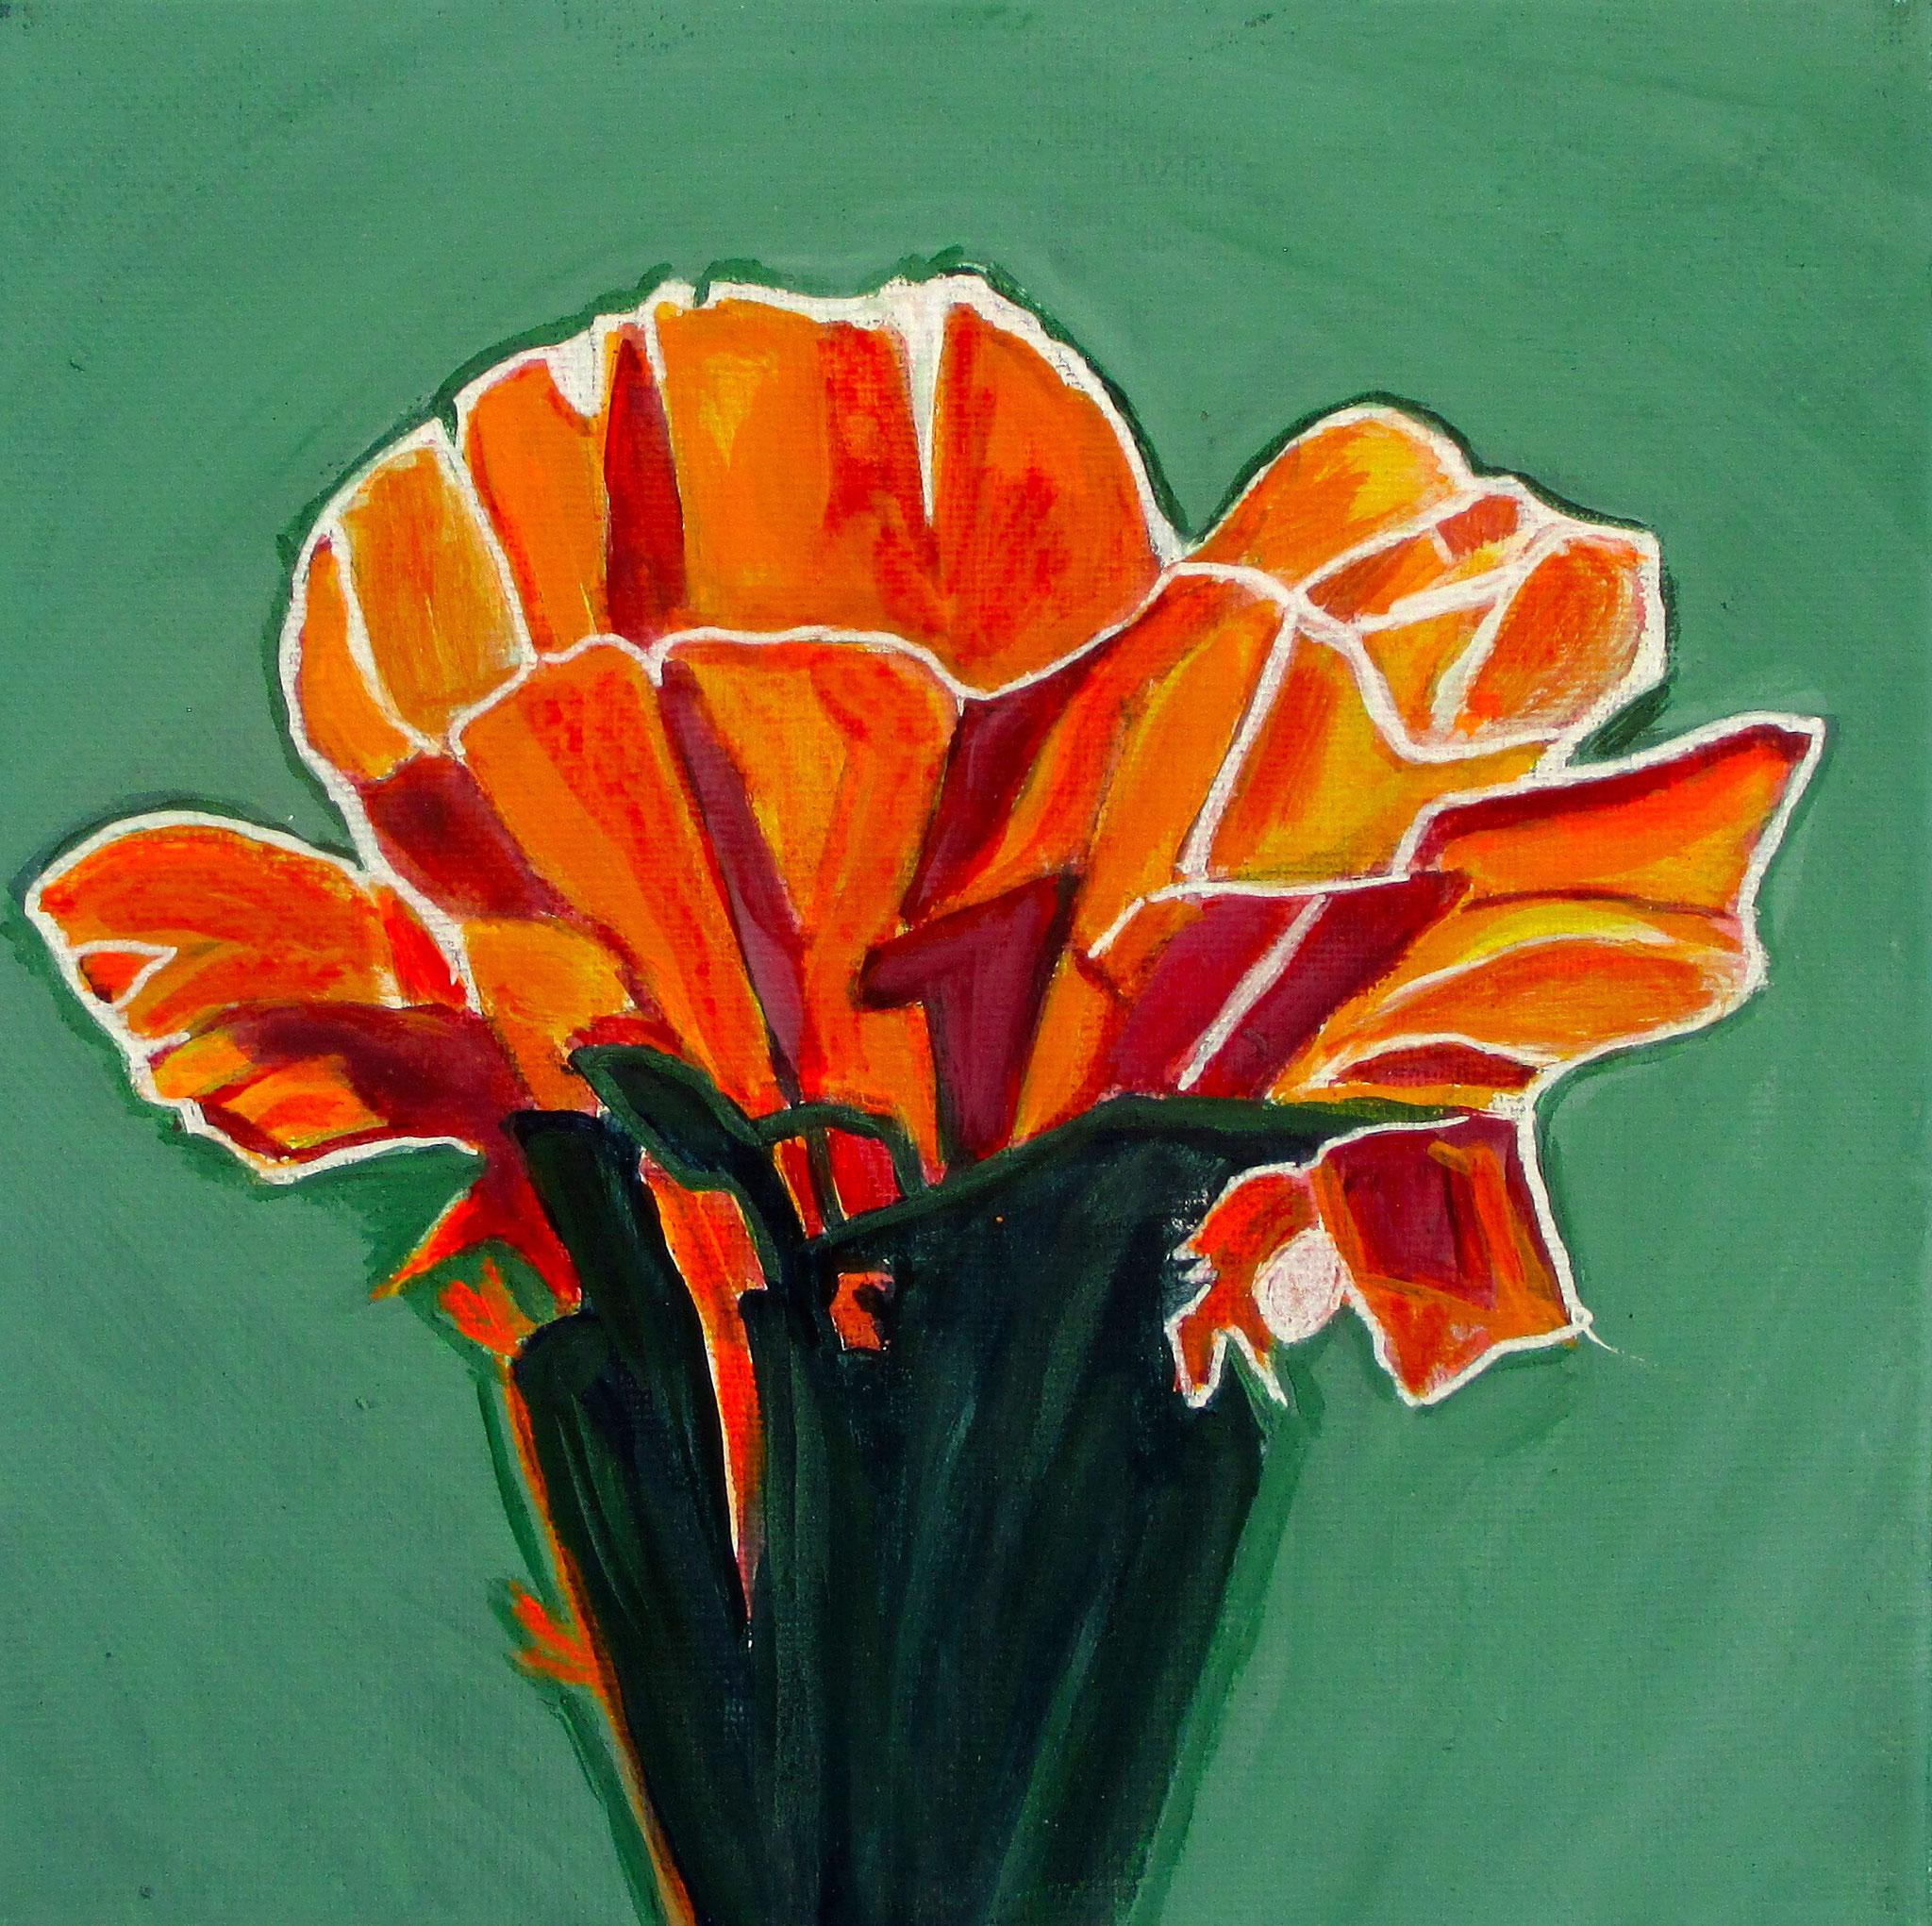 Apricot Glow, acrylic on canvas, 8 x 8, 2018